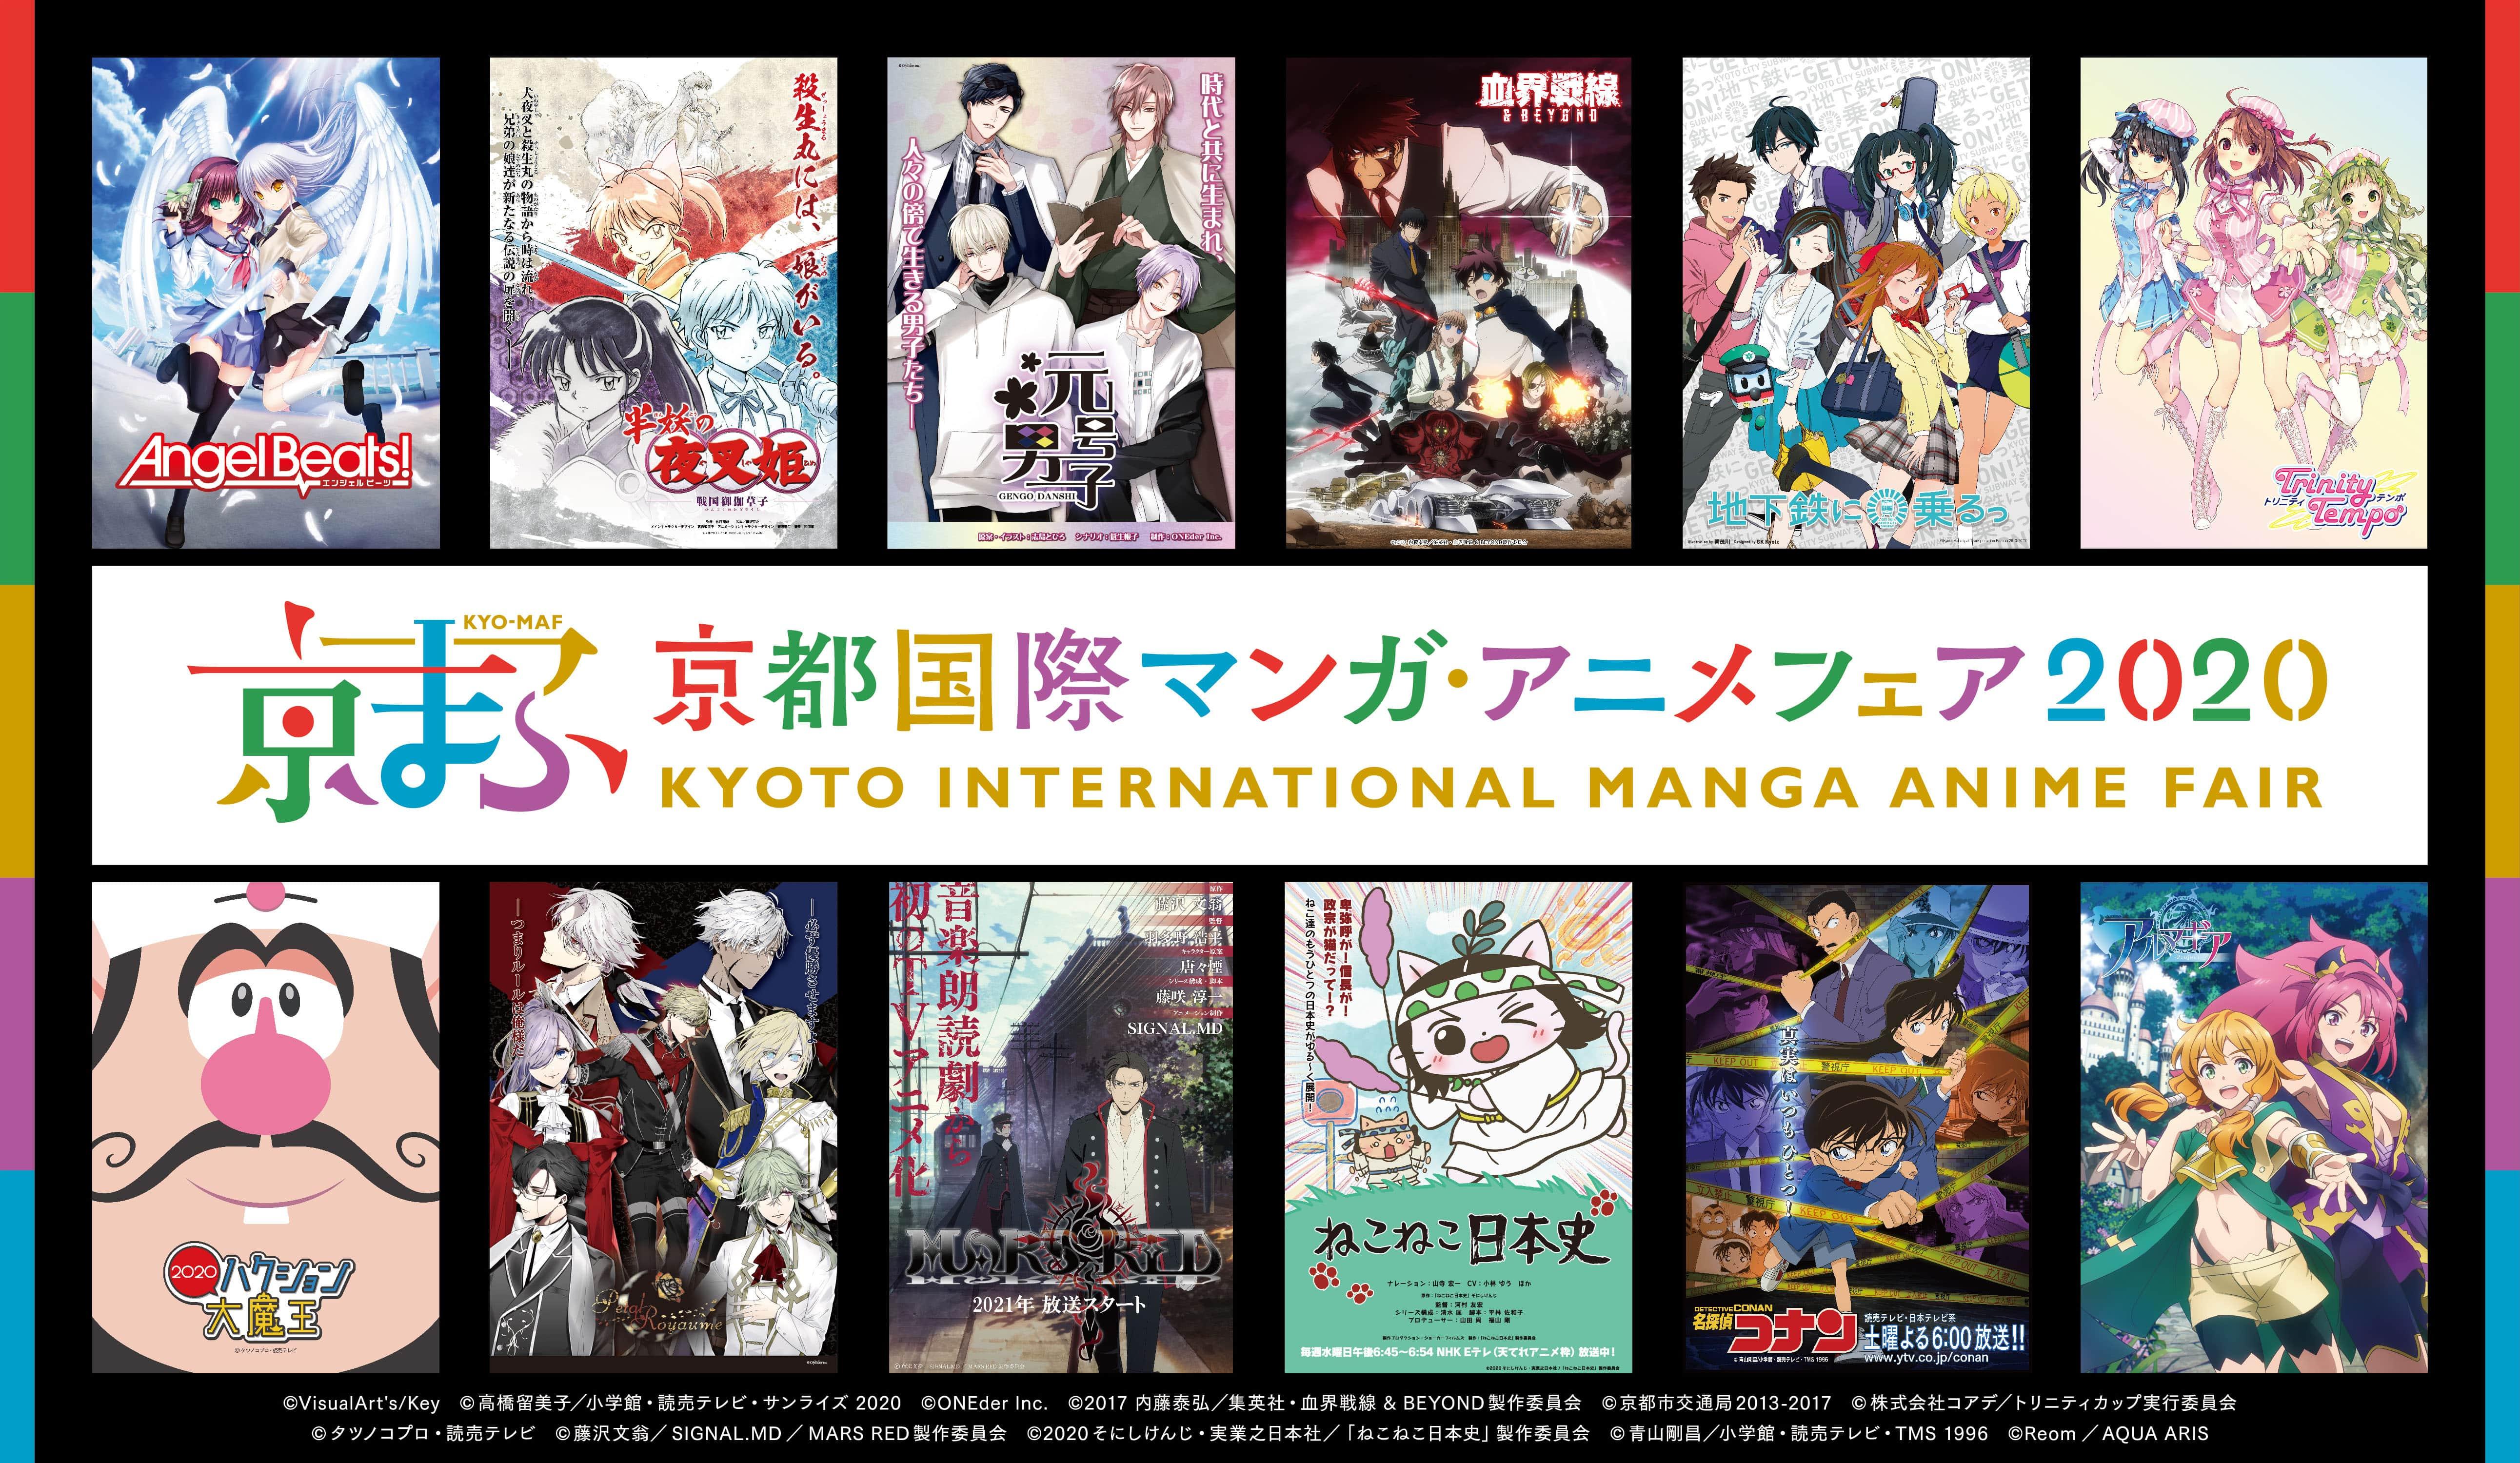 Kyoto International Manga and Anime Fair